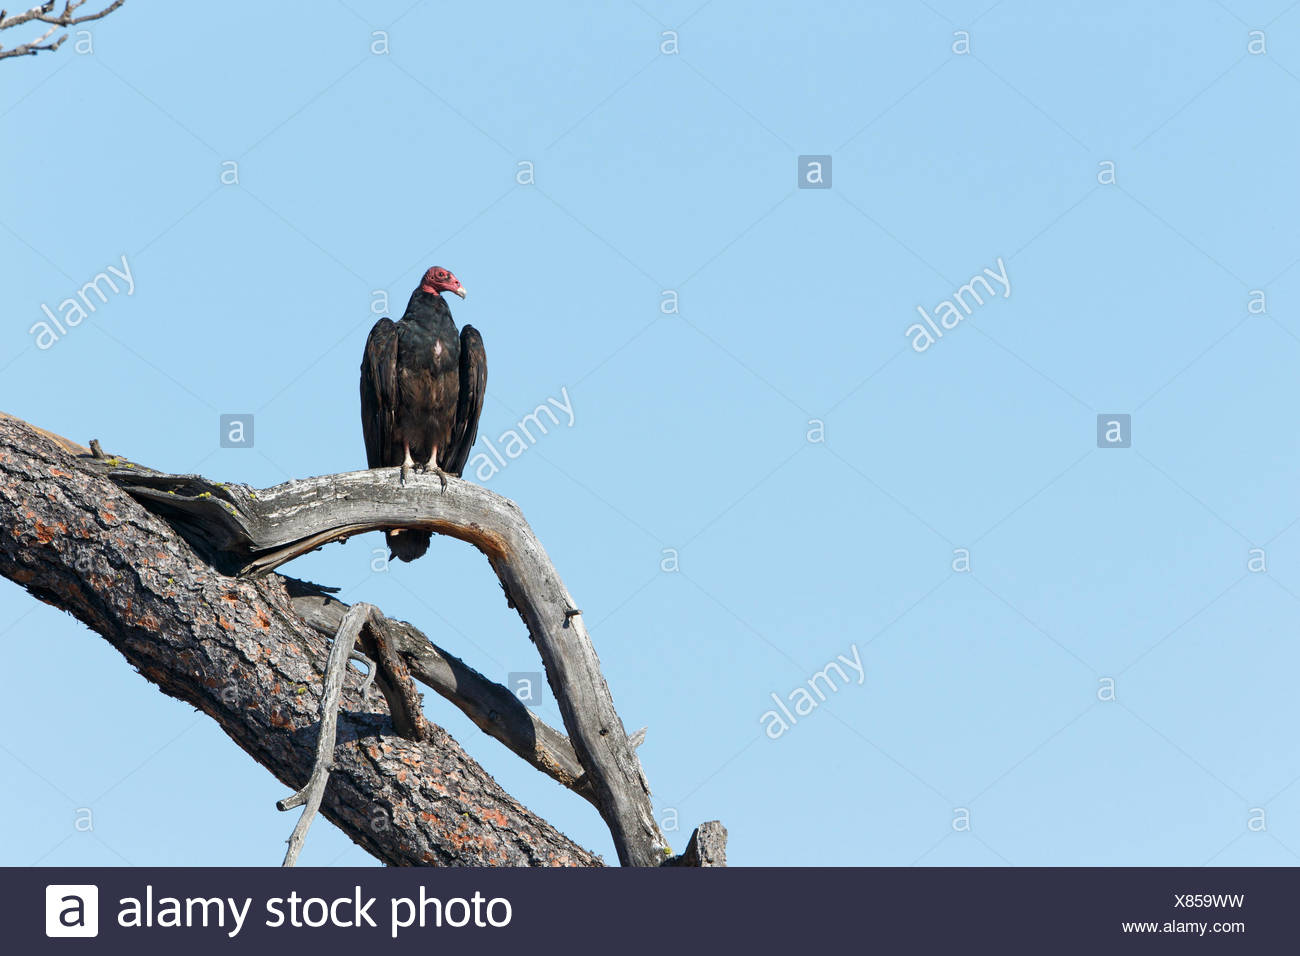 Turkey vulture (Cathartes aura), ThompsonNicola region, British Columbia, Canada - Stock Image